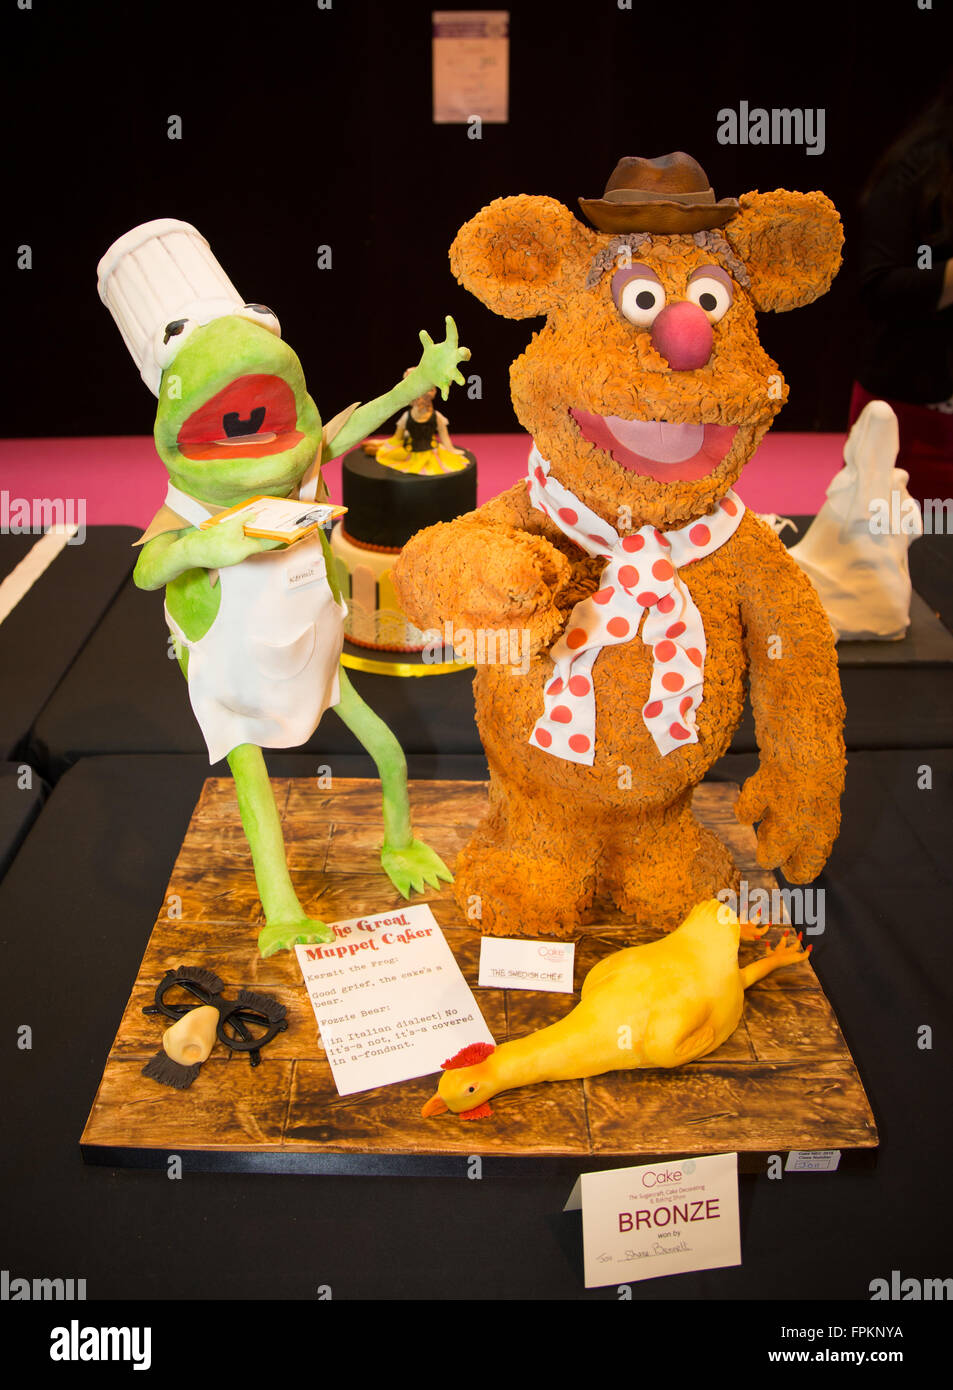 Birmingham, UK  19th March, 2016  Muppets characters Kermit